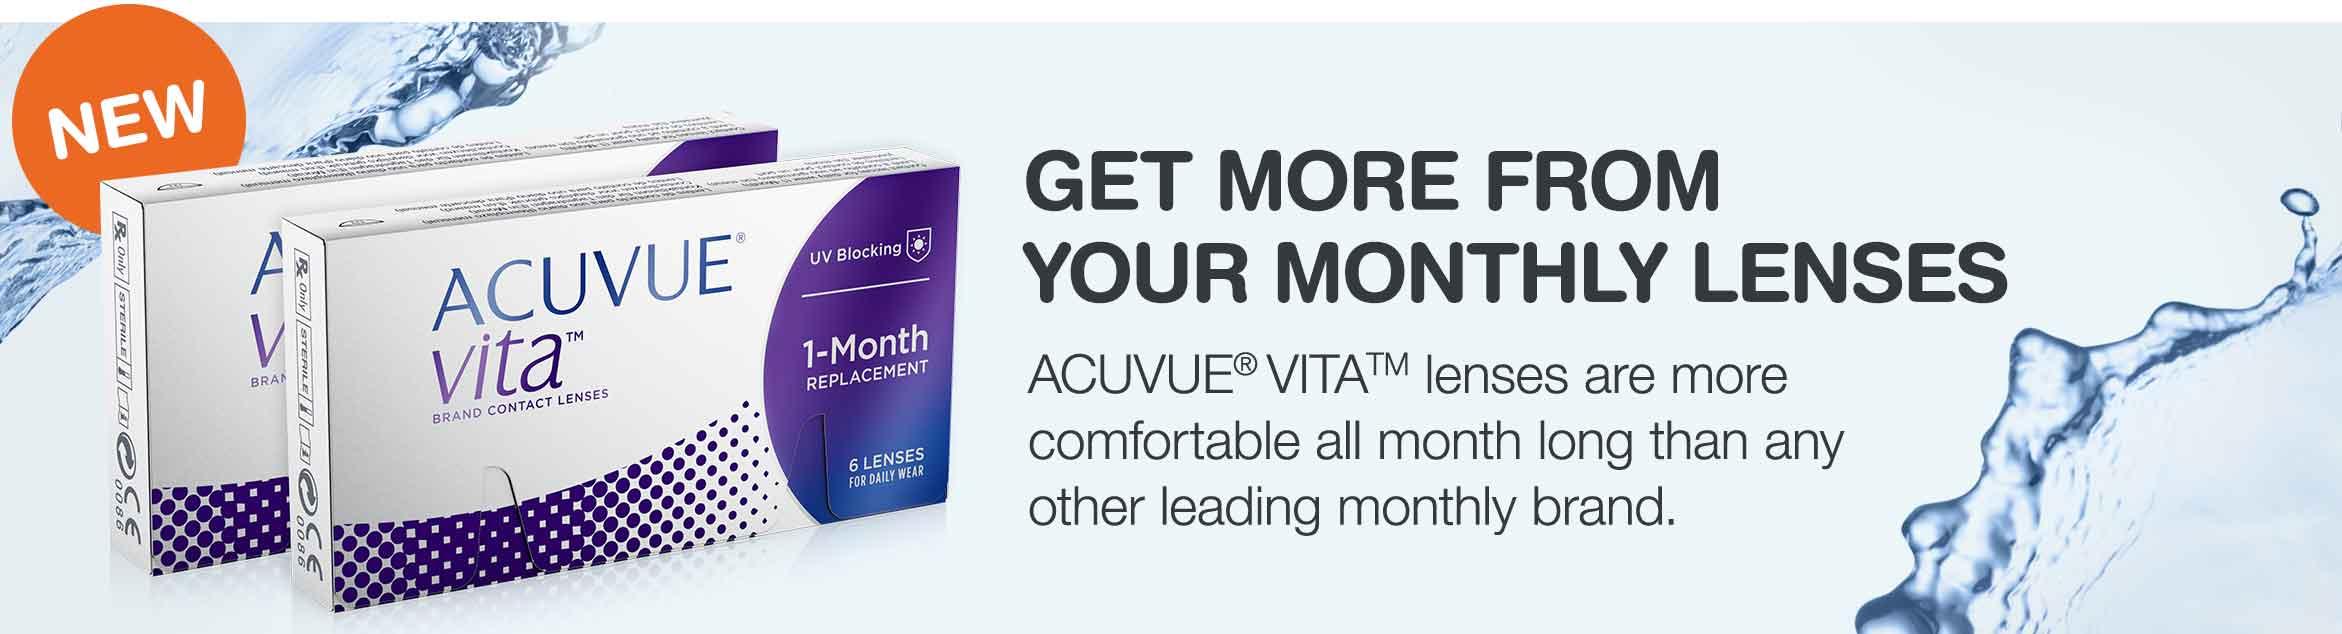 Acuvue Vita contact lens box